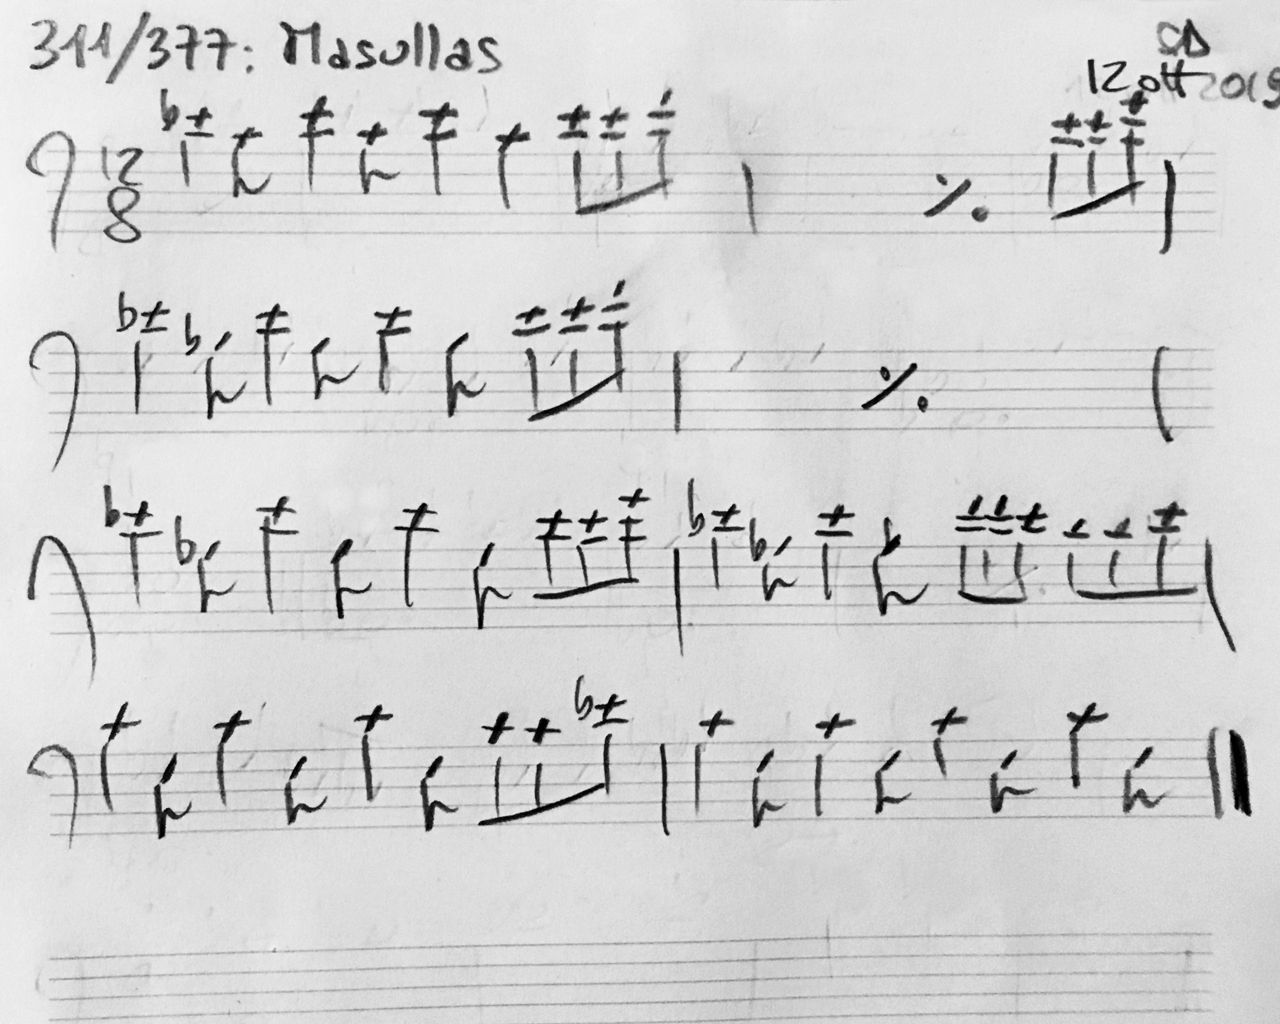 311-Masullas-score